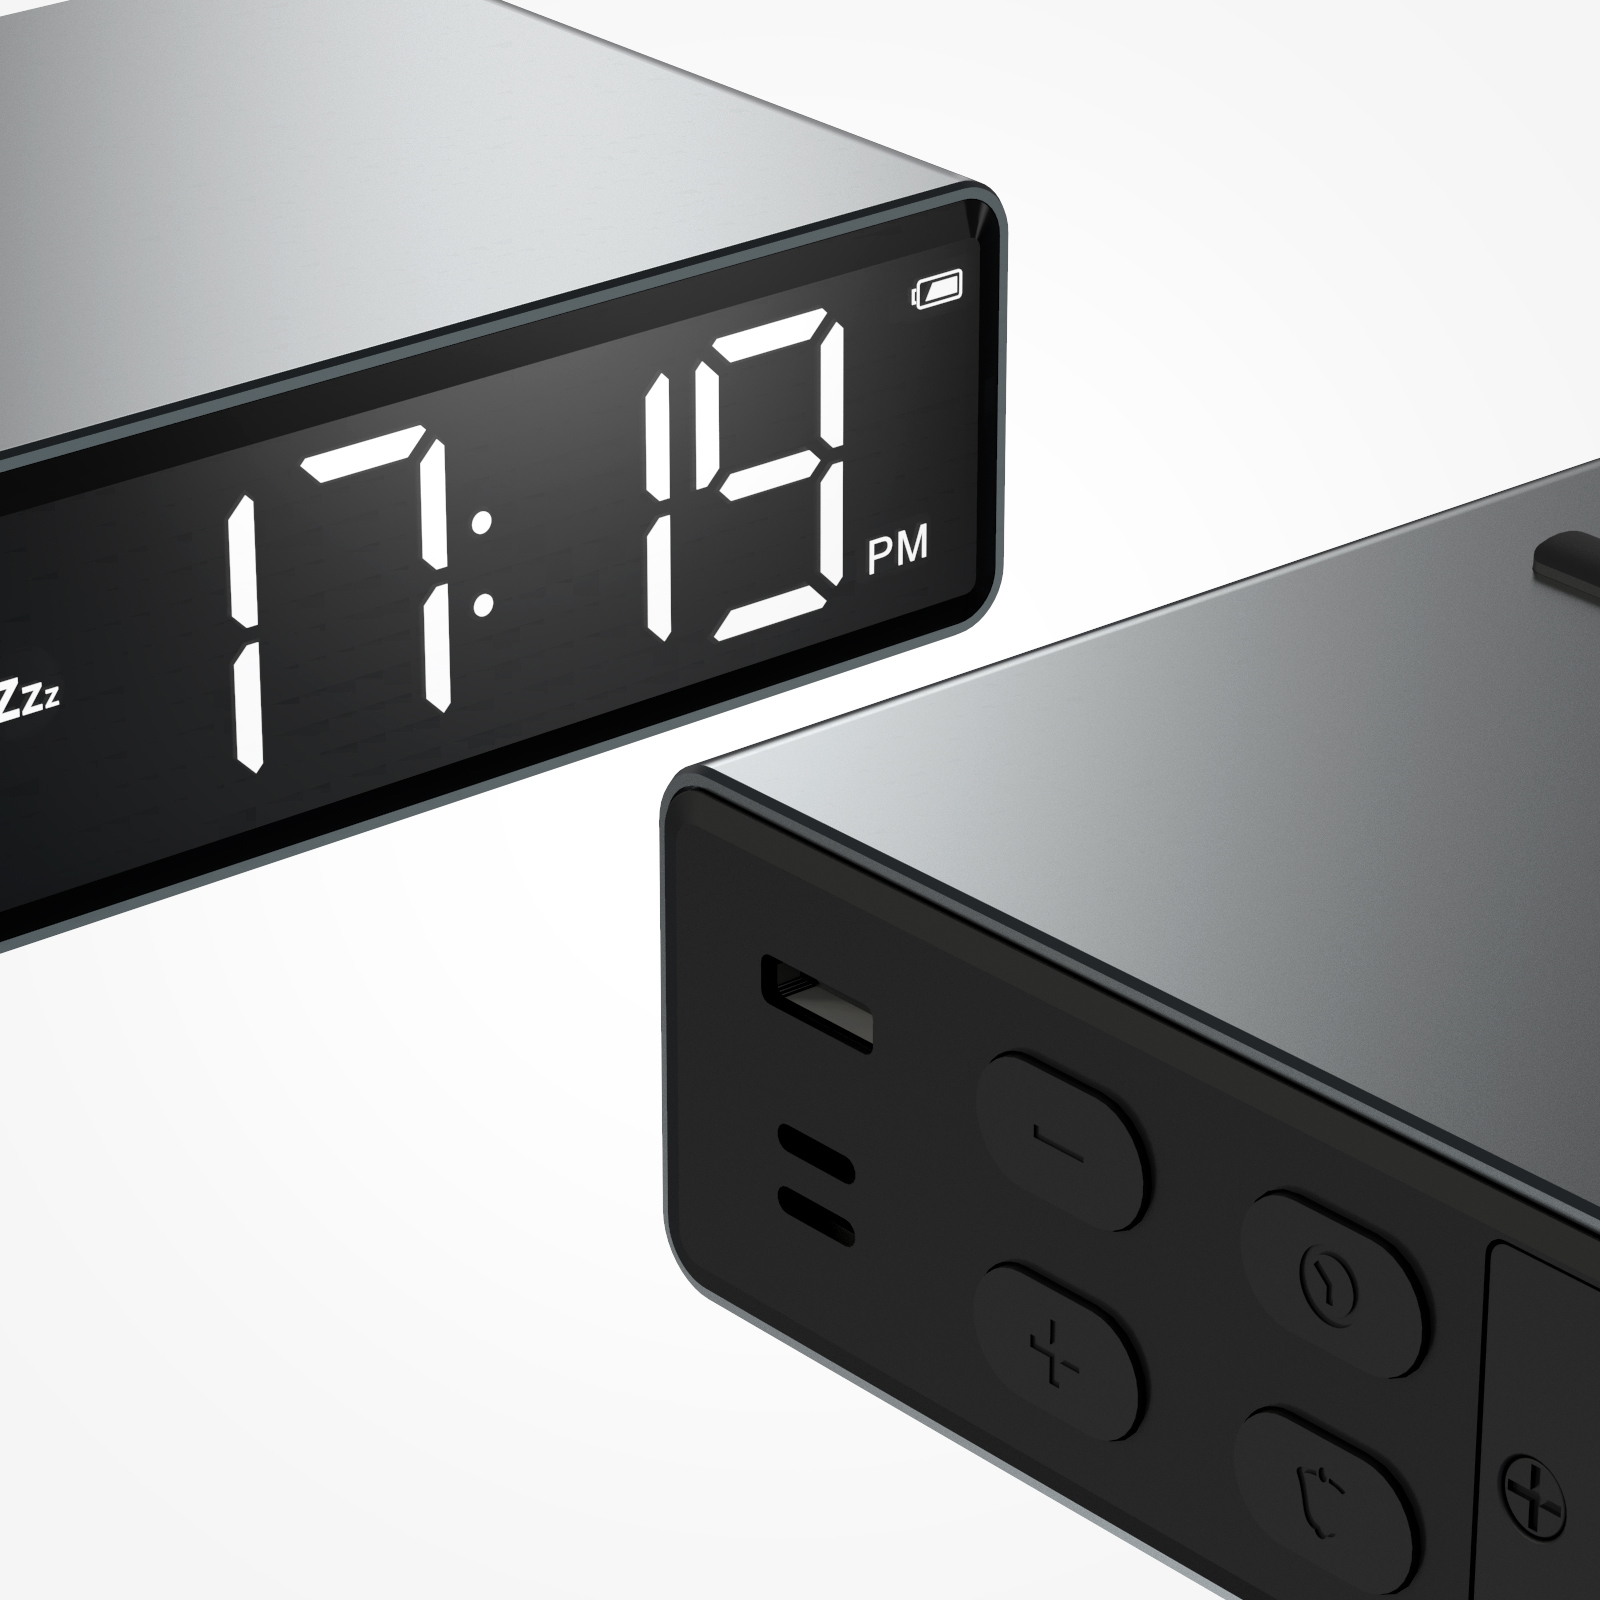 2020 Hot Selling Desk Table Digital LED Clock Alarm Mini Cheap Home Office Students Night Light Clock